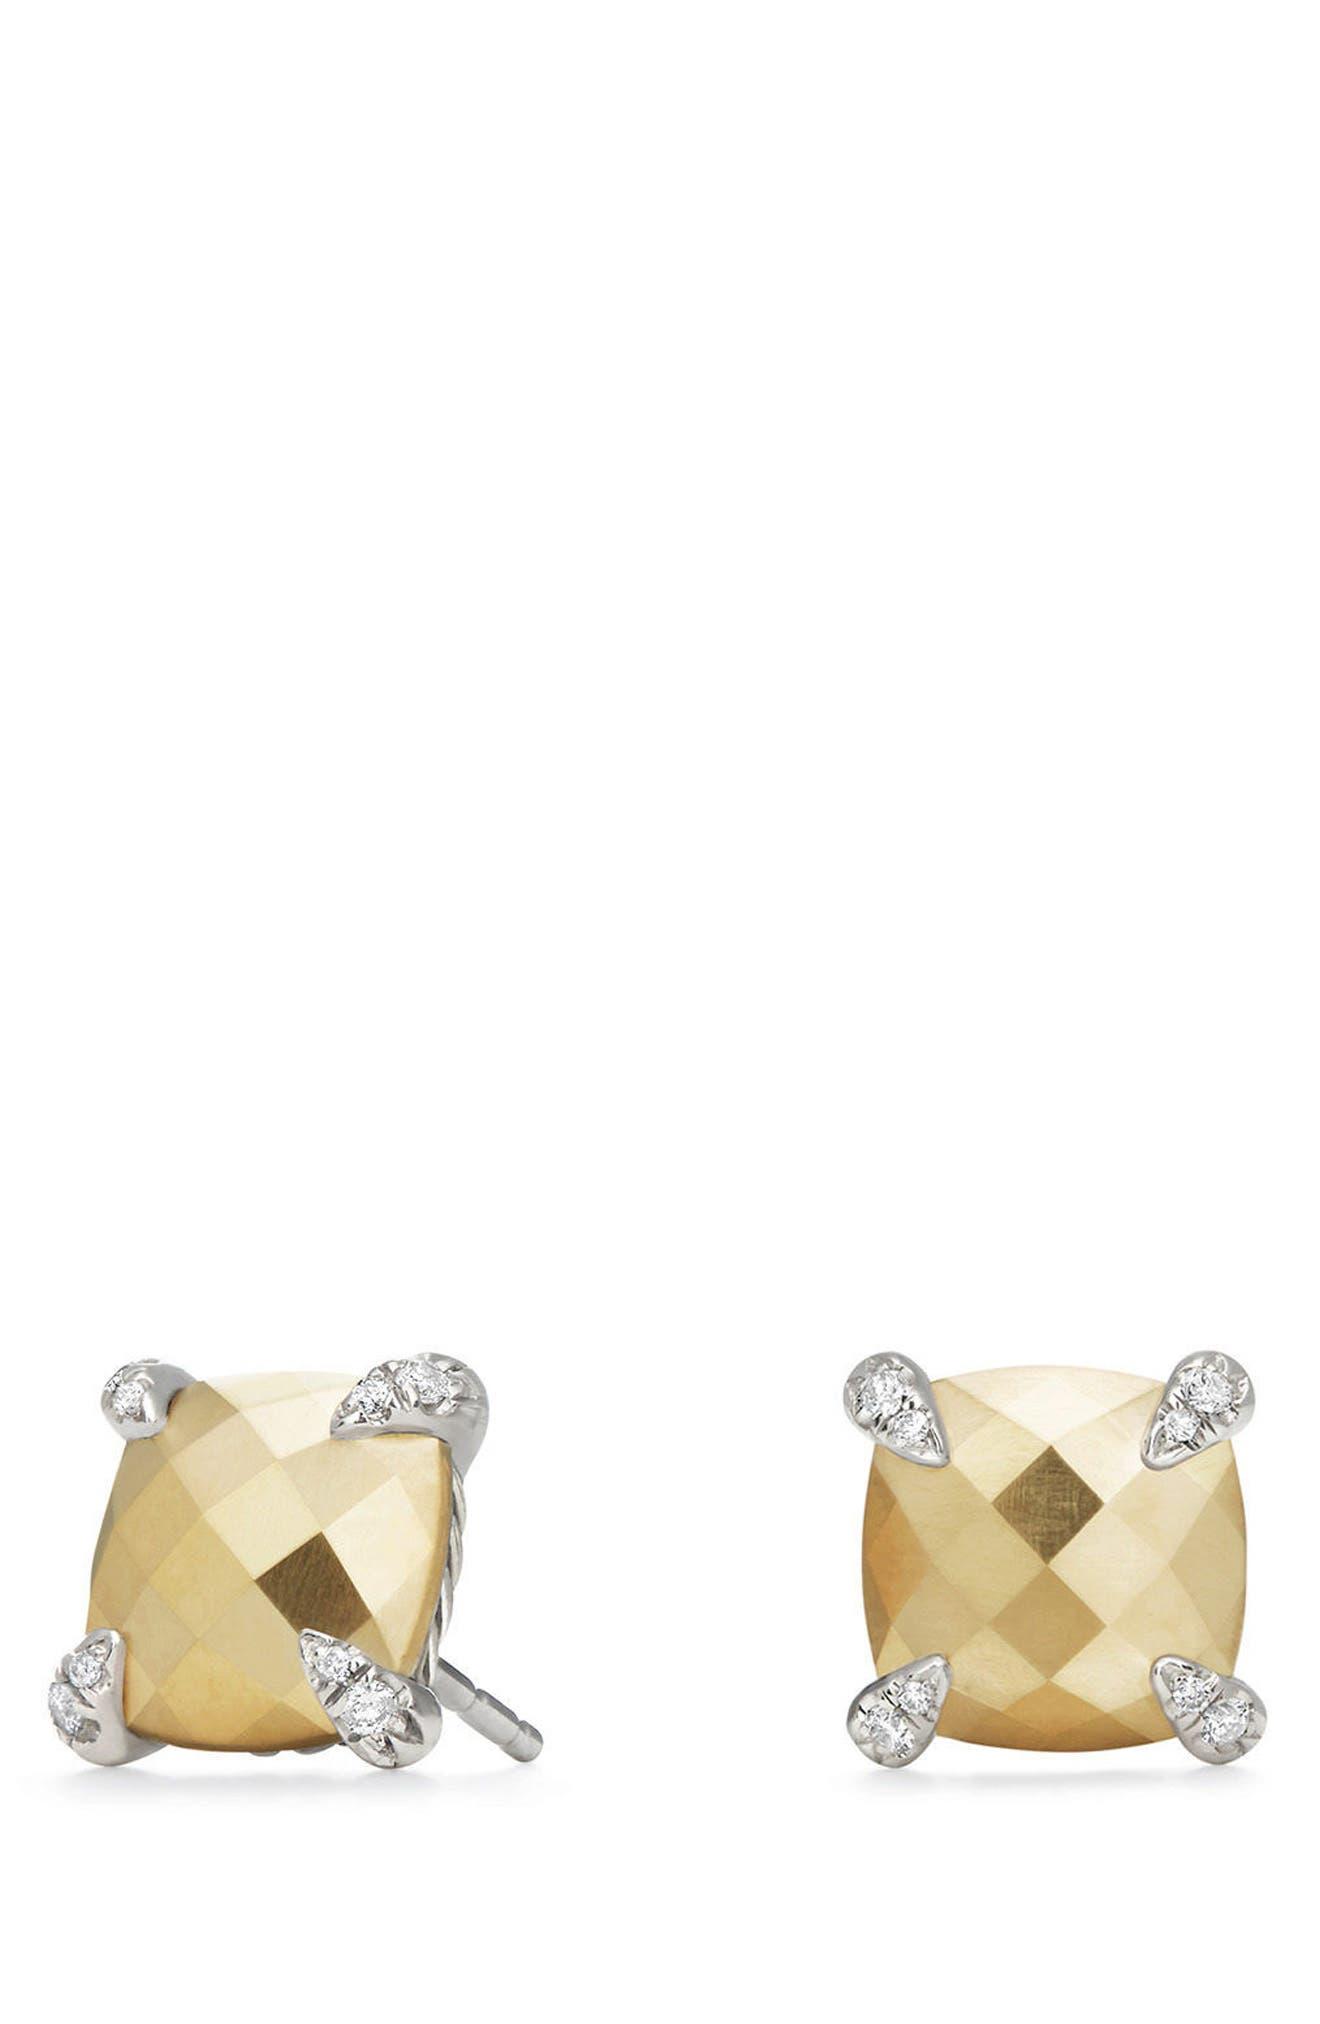 DAVID YURMAN Châtelaine Earrings with Diamonds